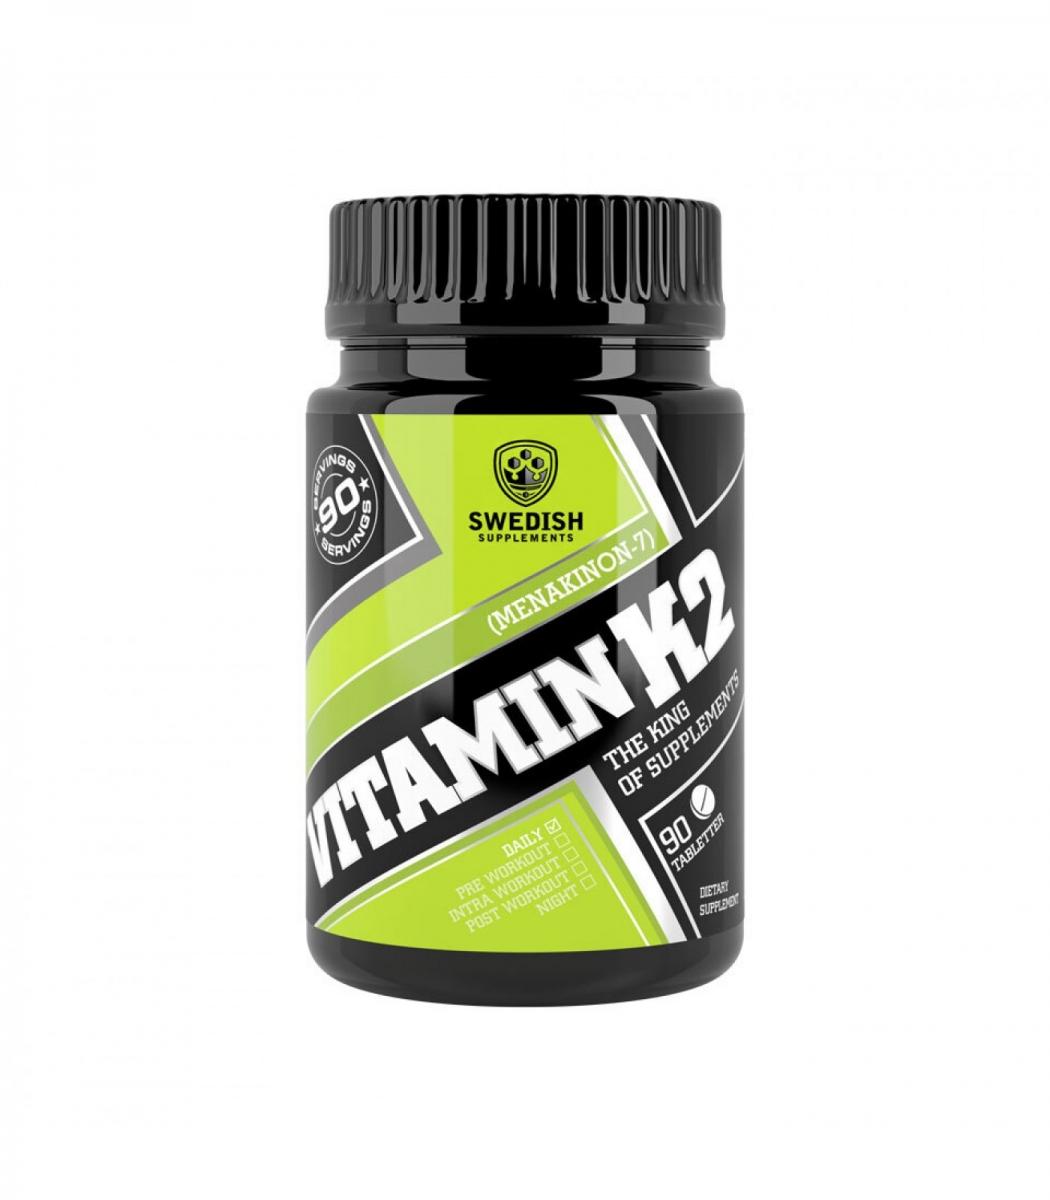 SWEDISH Supplements Vitamin K2 200mcg 90tabs